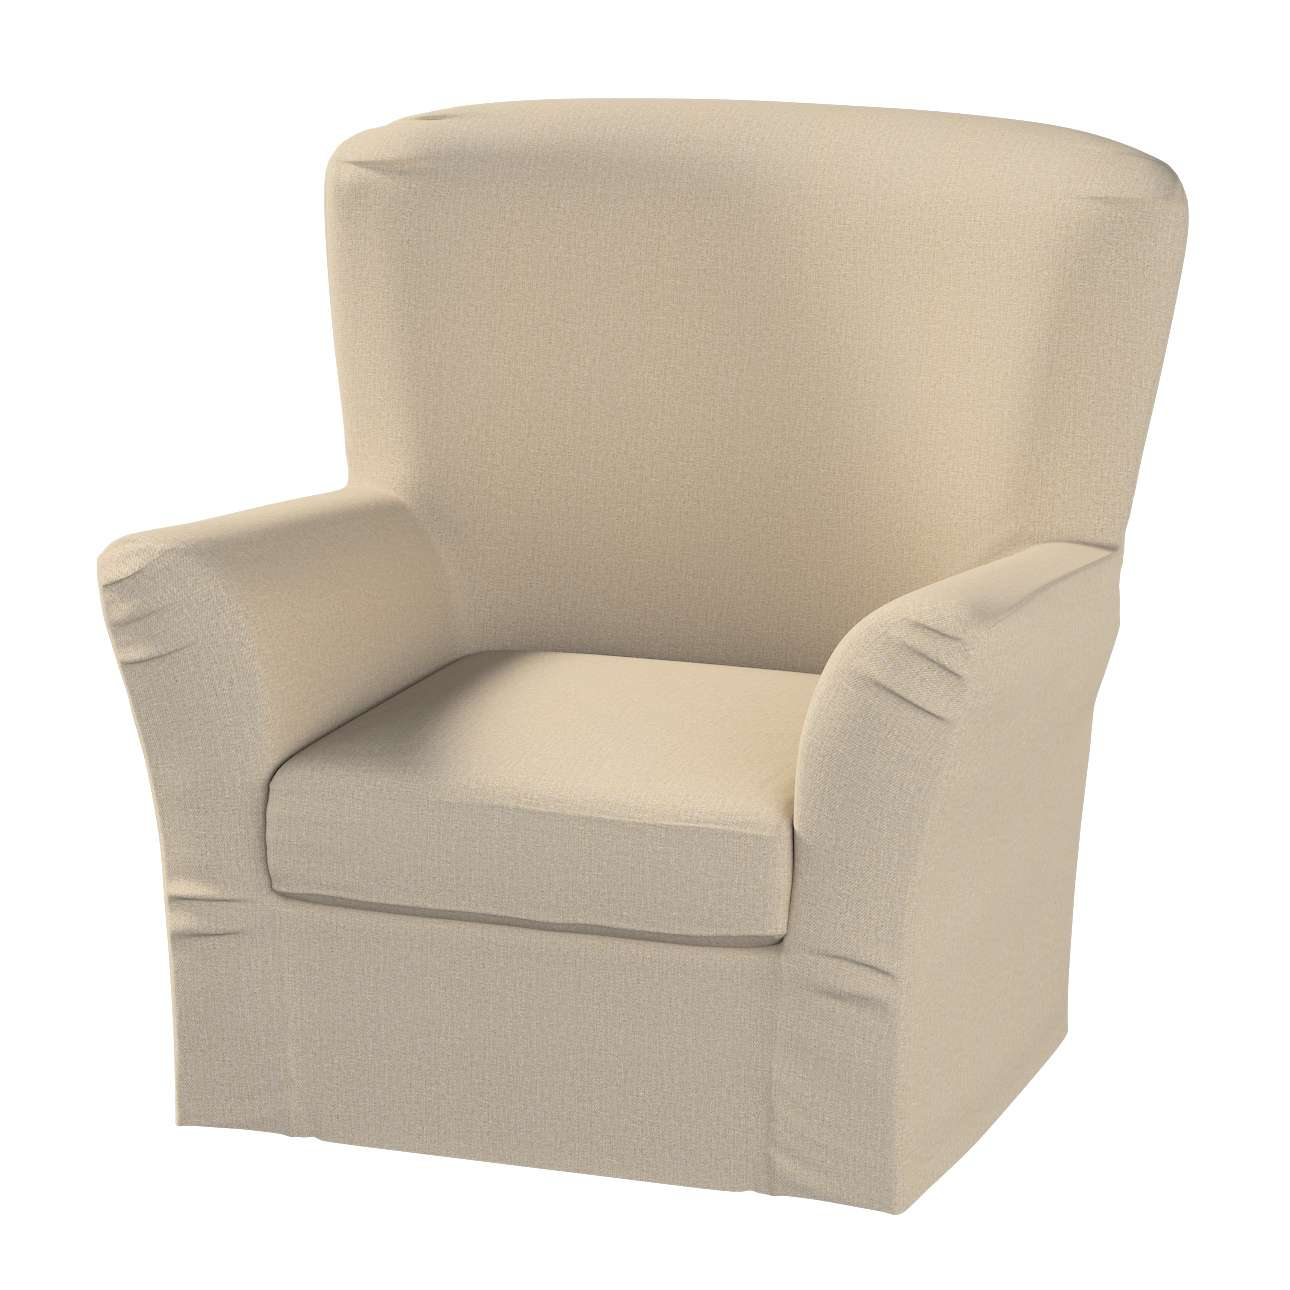 TOMELILLA fotelio užvalkalas TOMELILLA fotelis kolekcijoje Edinburgh , audinys: 115-78